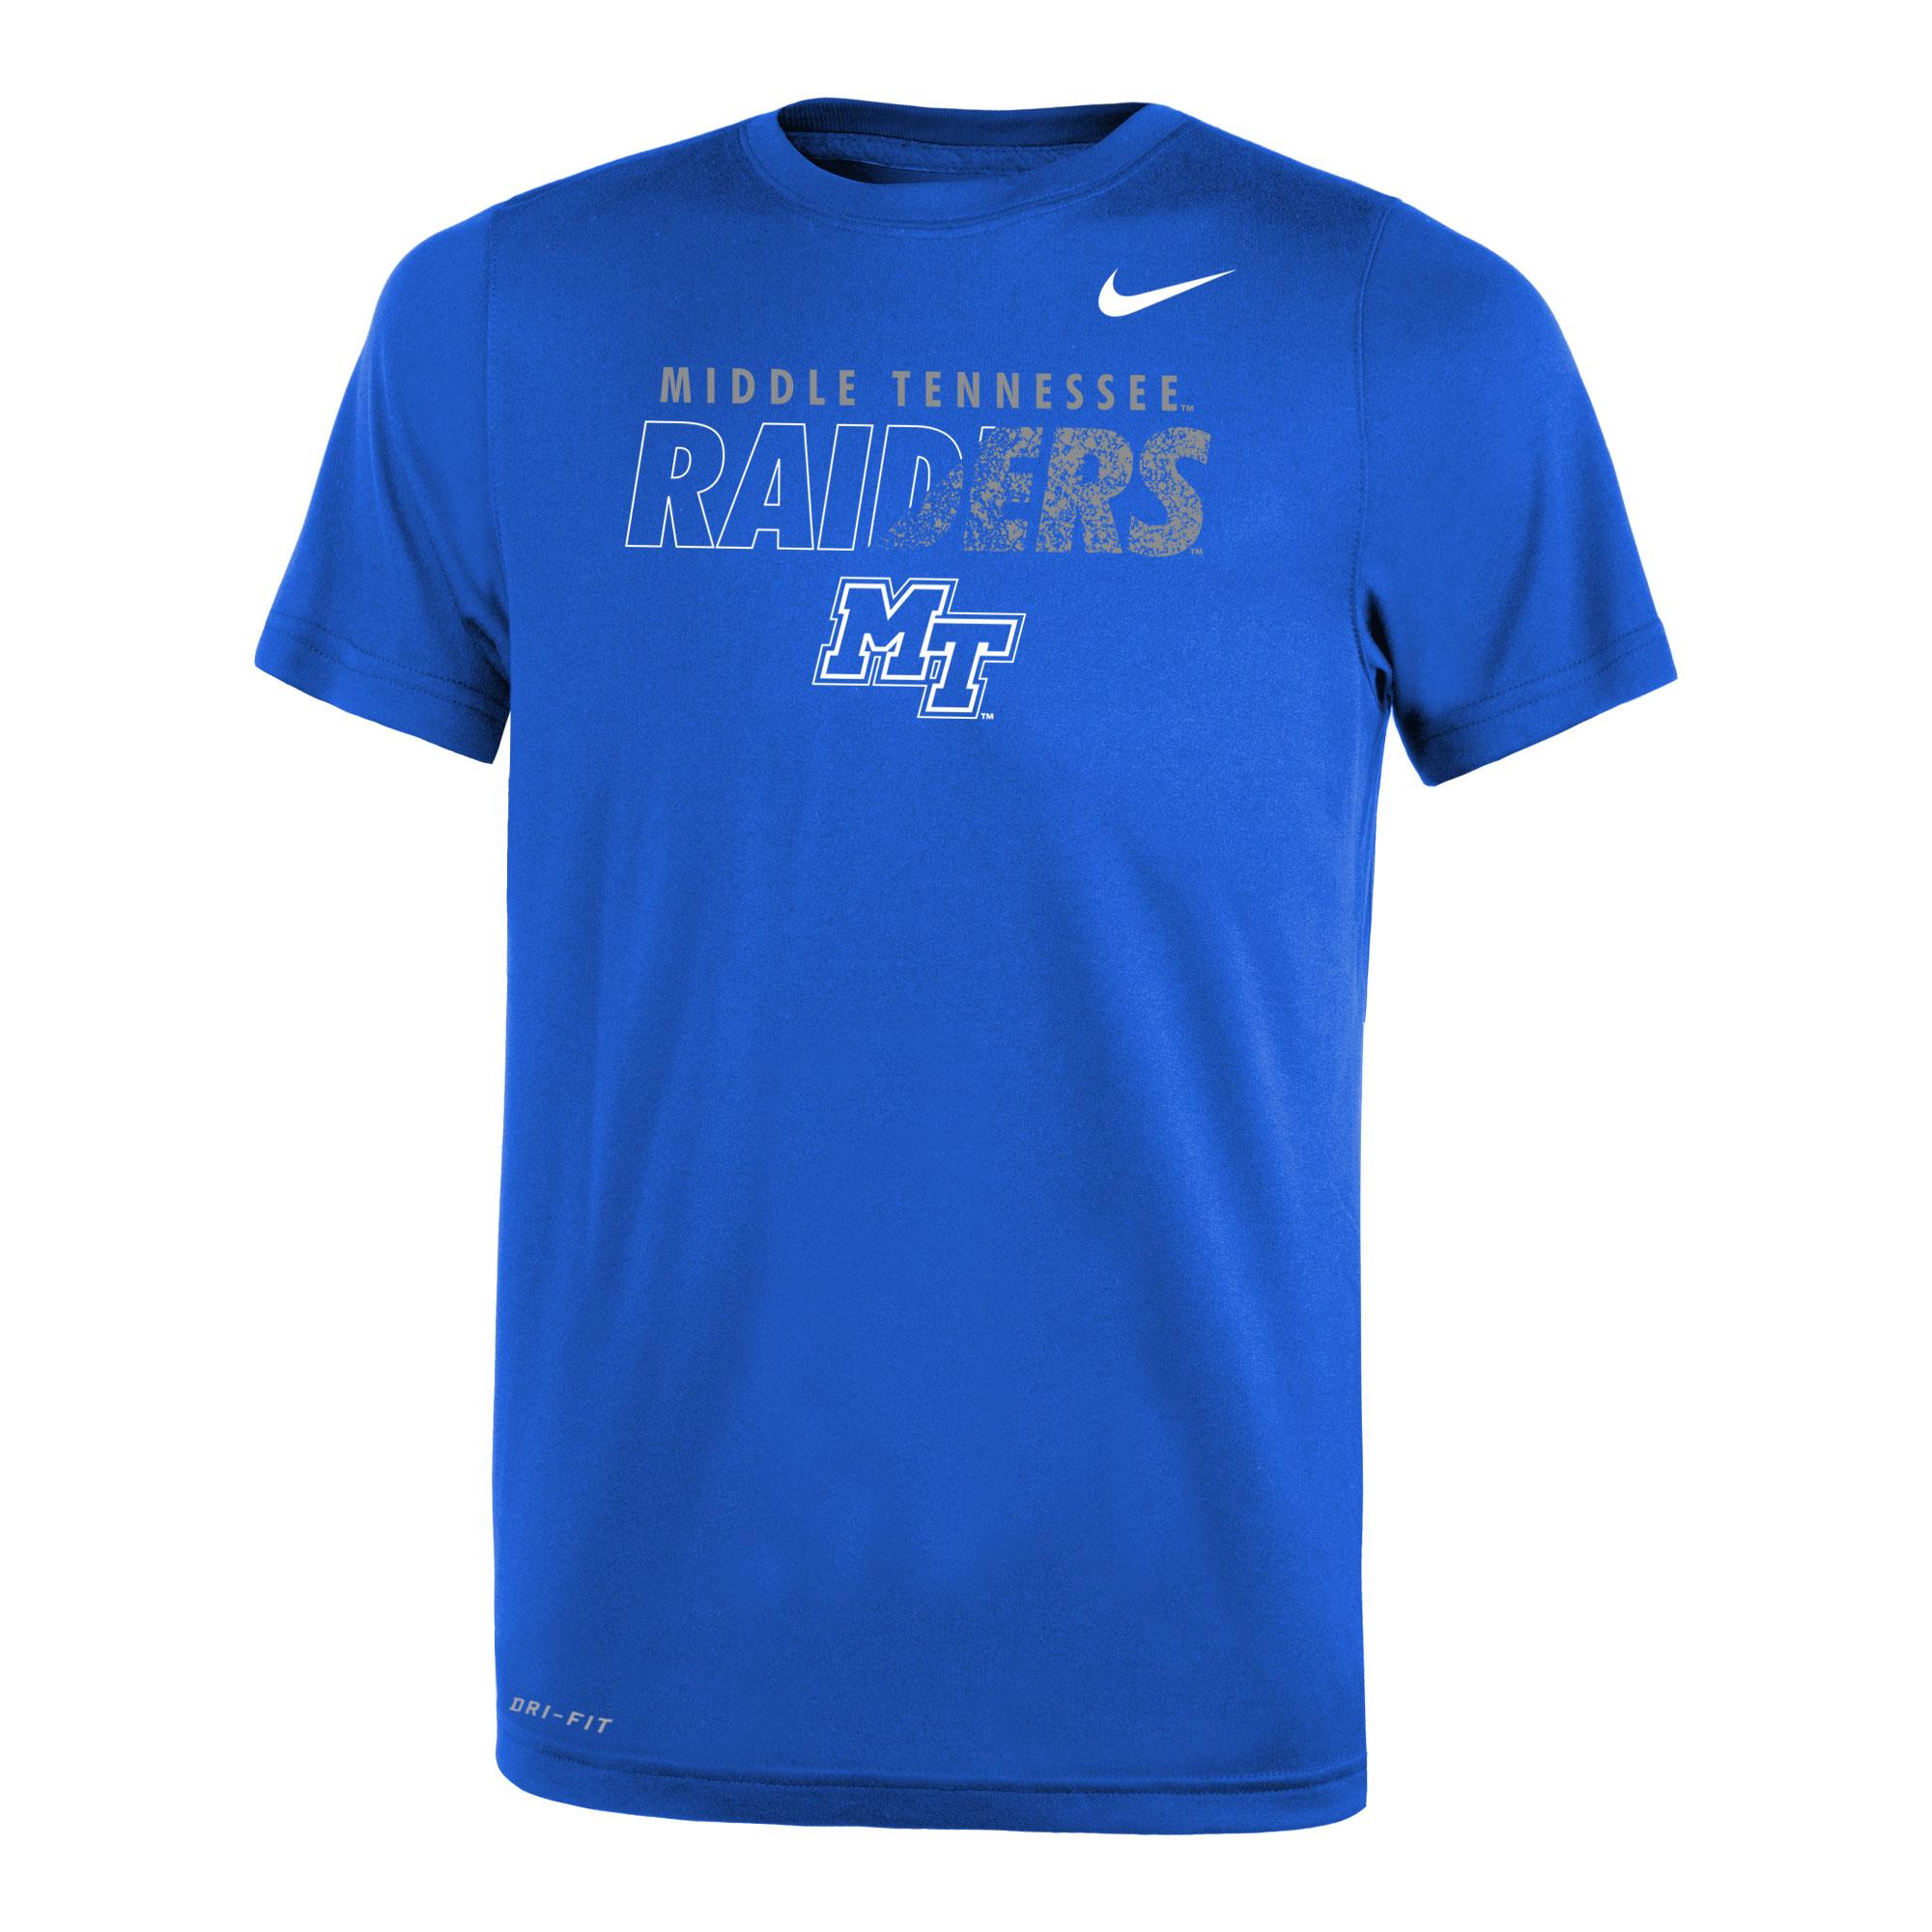 Middle Tennessee Raiders w/ MT Logo Youth Nike® Dri-Fit Legend 2.0 Tshirt